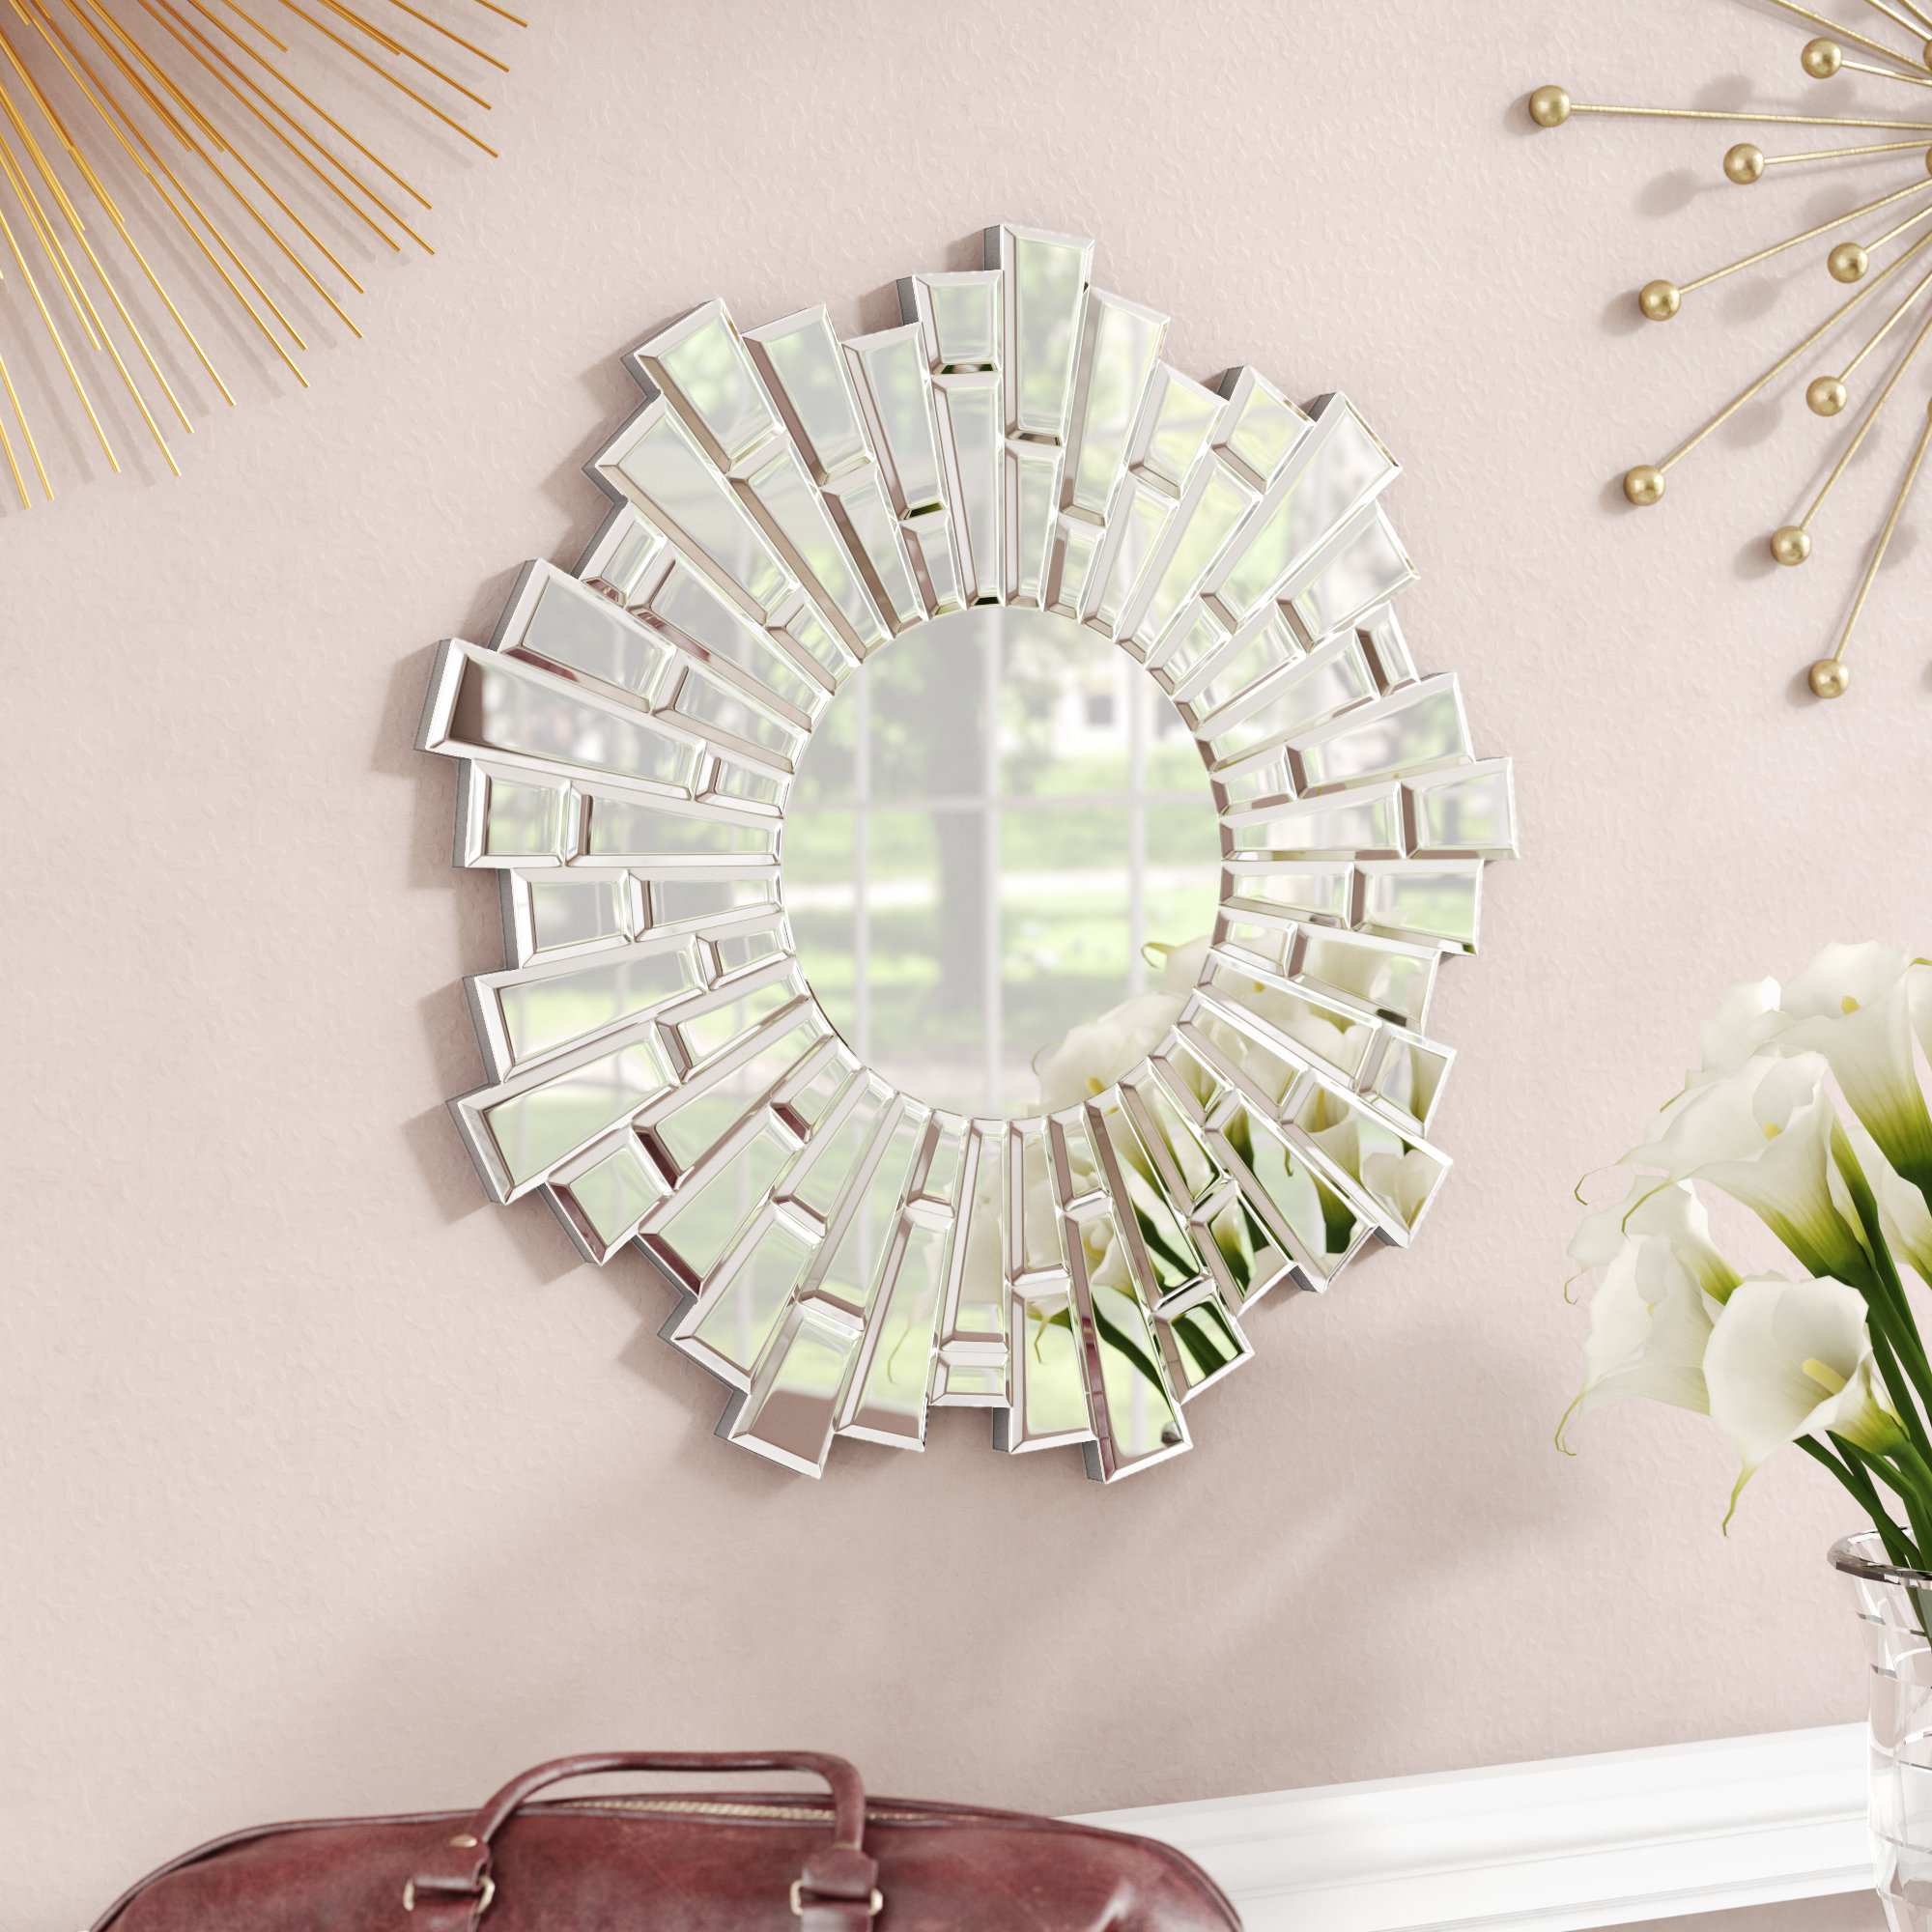 Sunburst Wall Mirrors You'll Love In 2019 | Wayfair Throughout Jarrod Sunburst Accent Mirrors (Image 19 of 20)